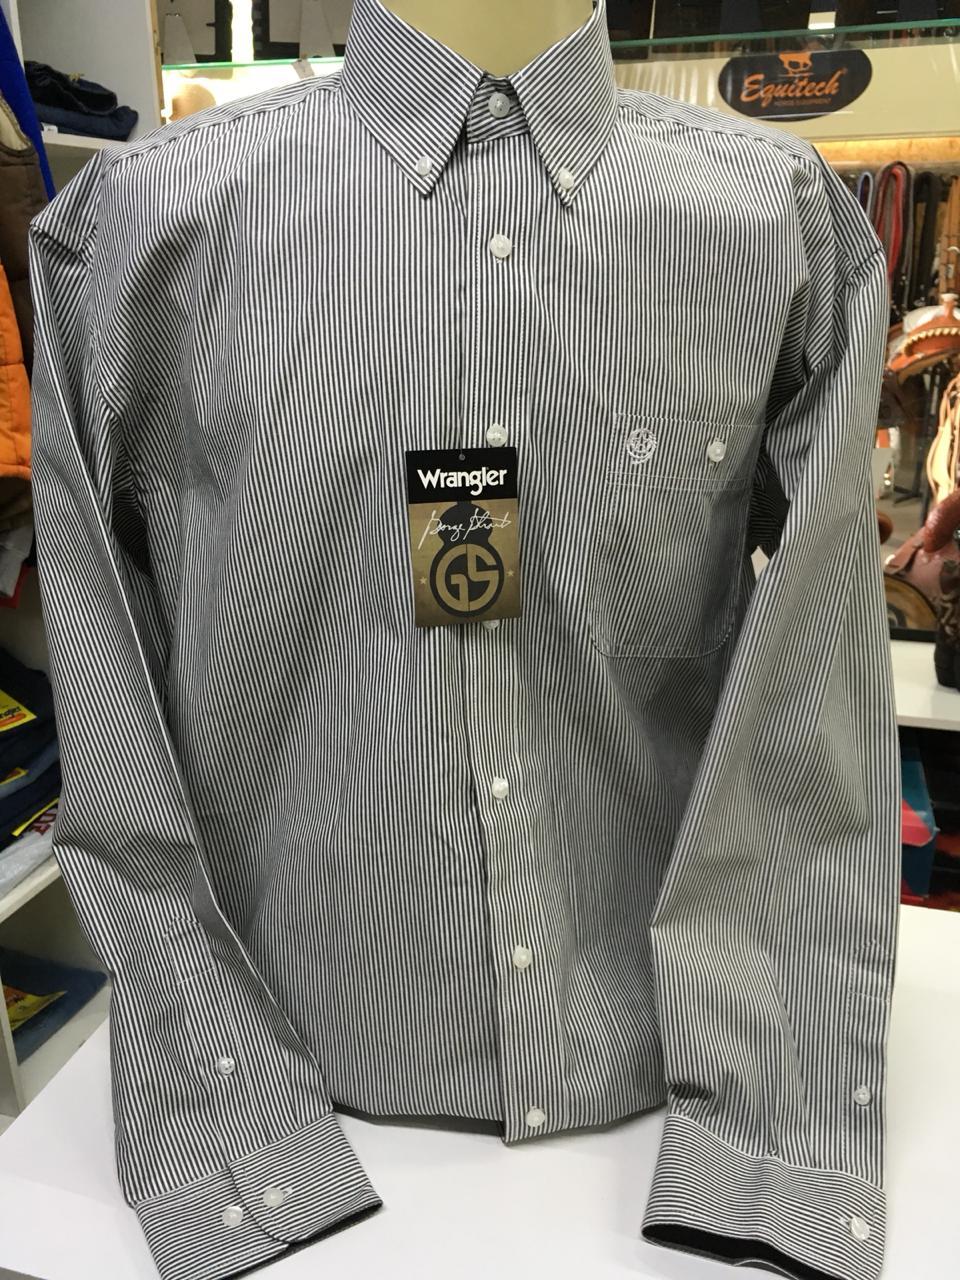 diseño profesional como serch precios baratass Camisa Wrangler Manga longa George Strait 005 ( GG )